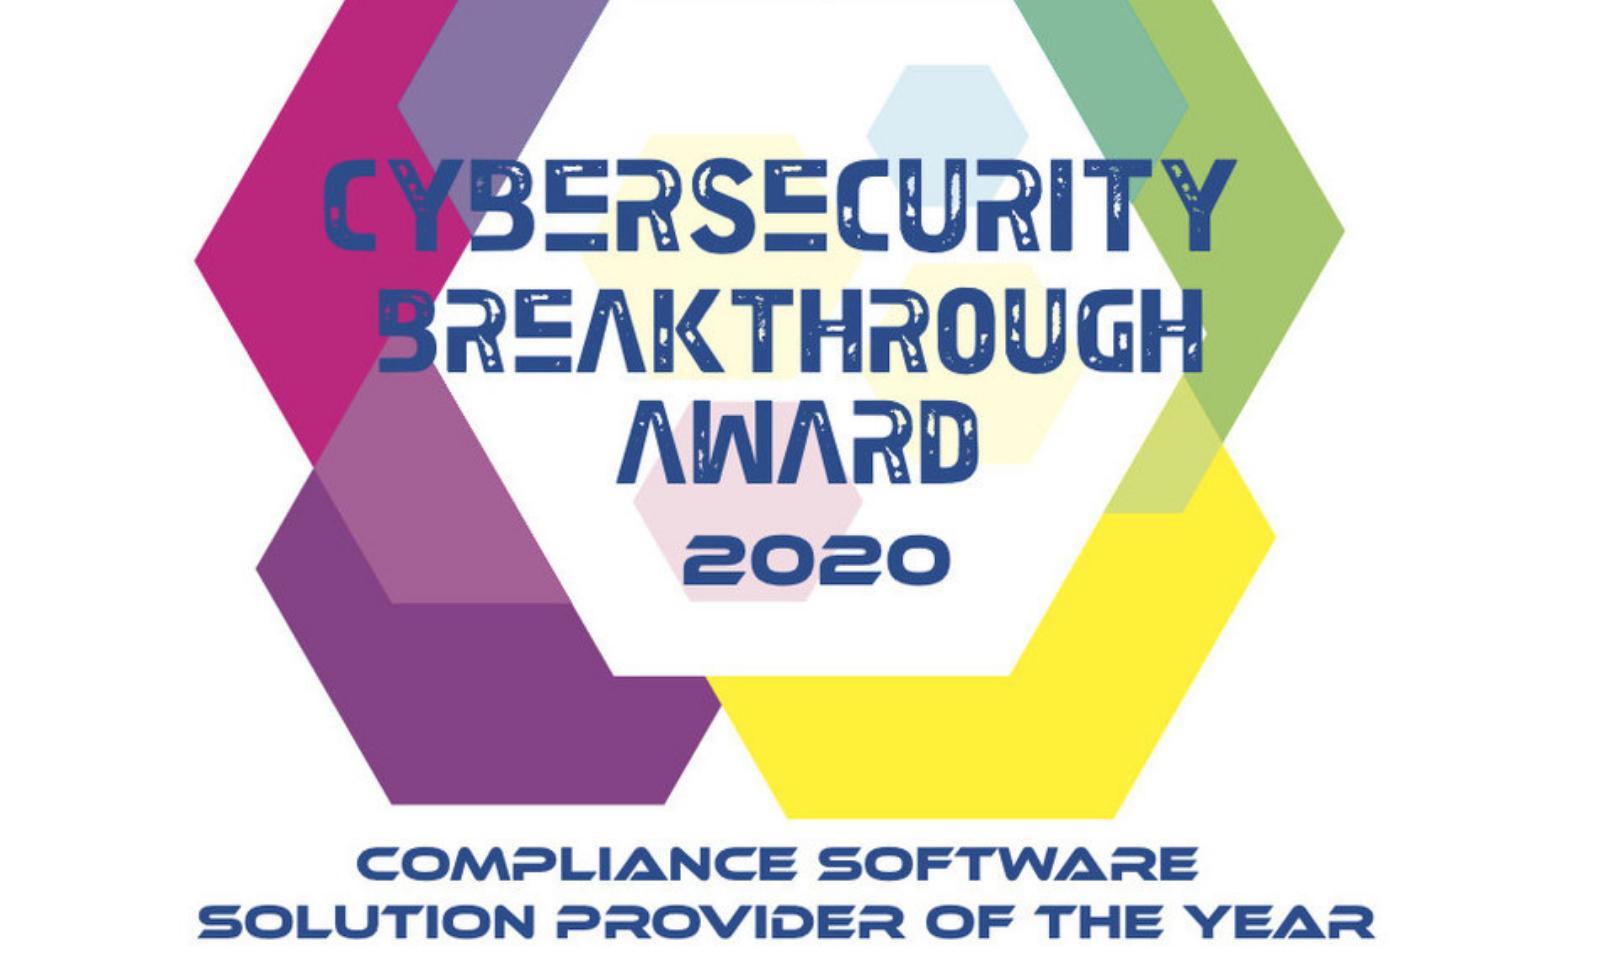 Cybersecurity Breakthrough Awards 2020